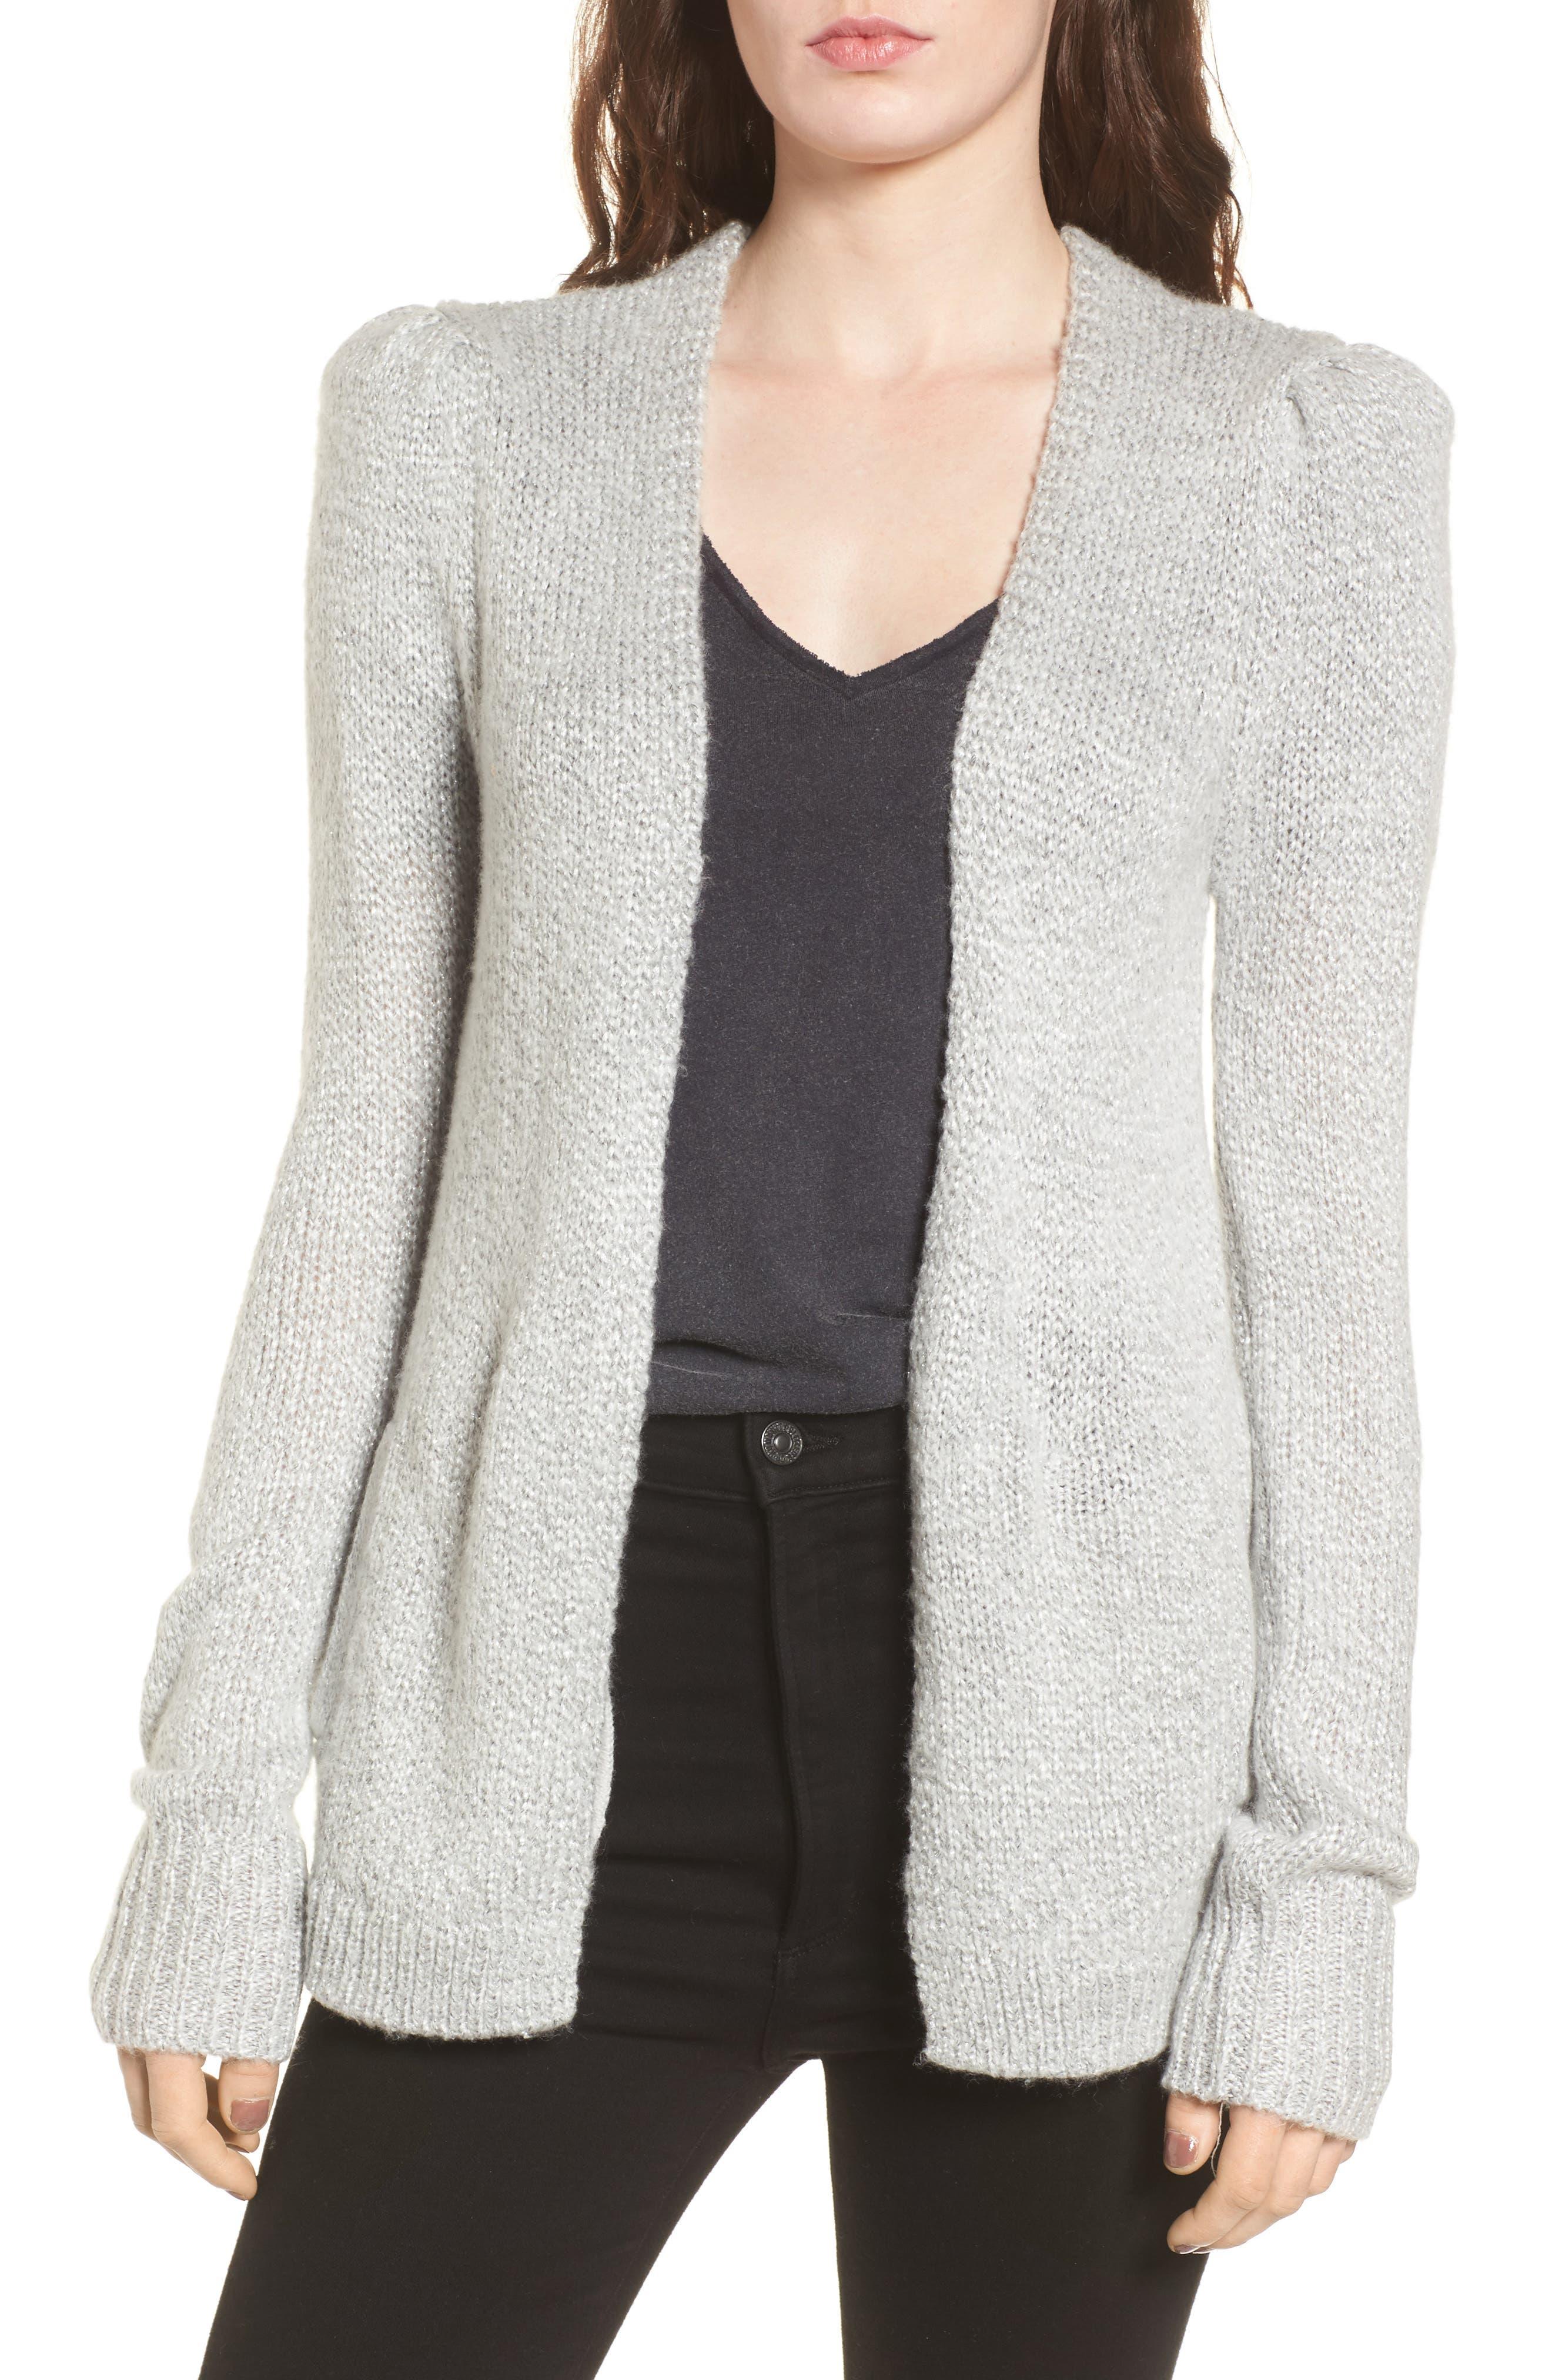 Shine Cardigan Sweater,                         Main,                         color, 020